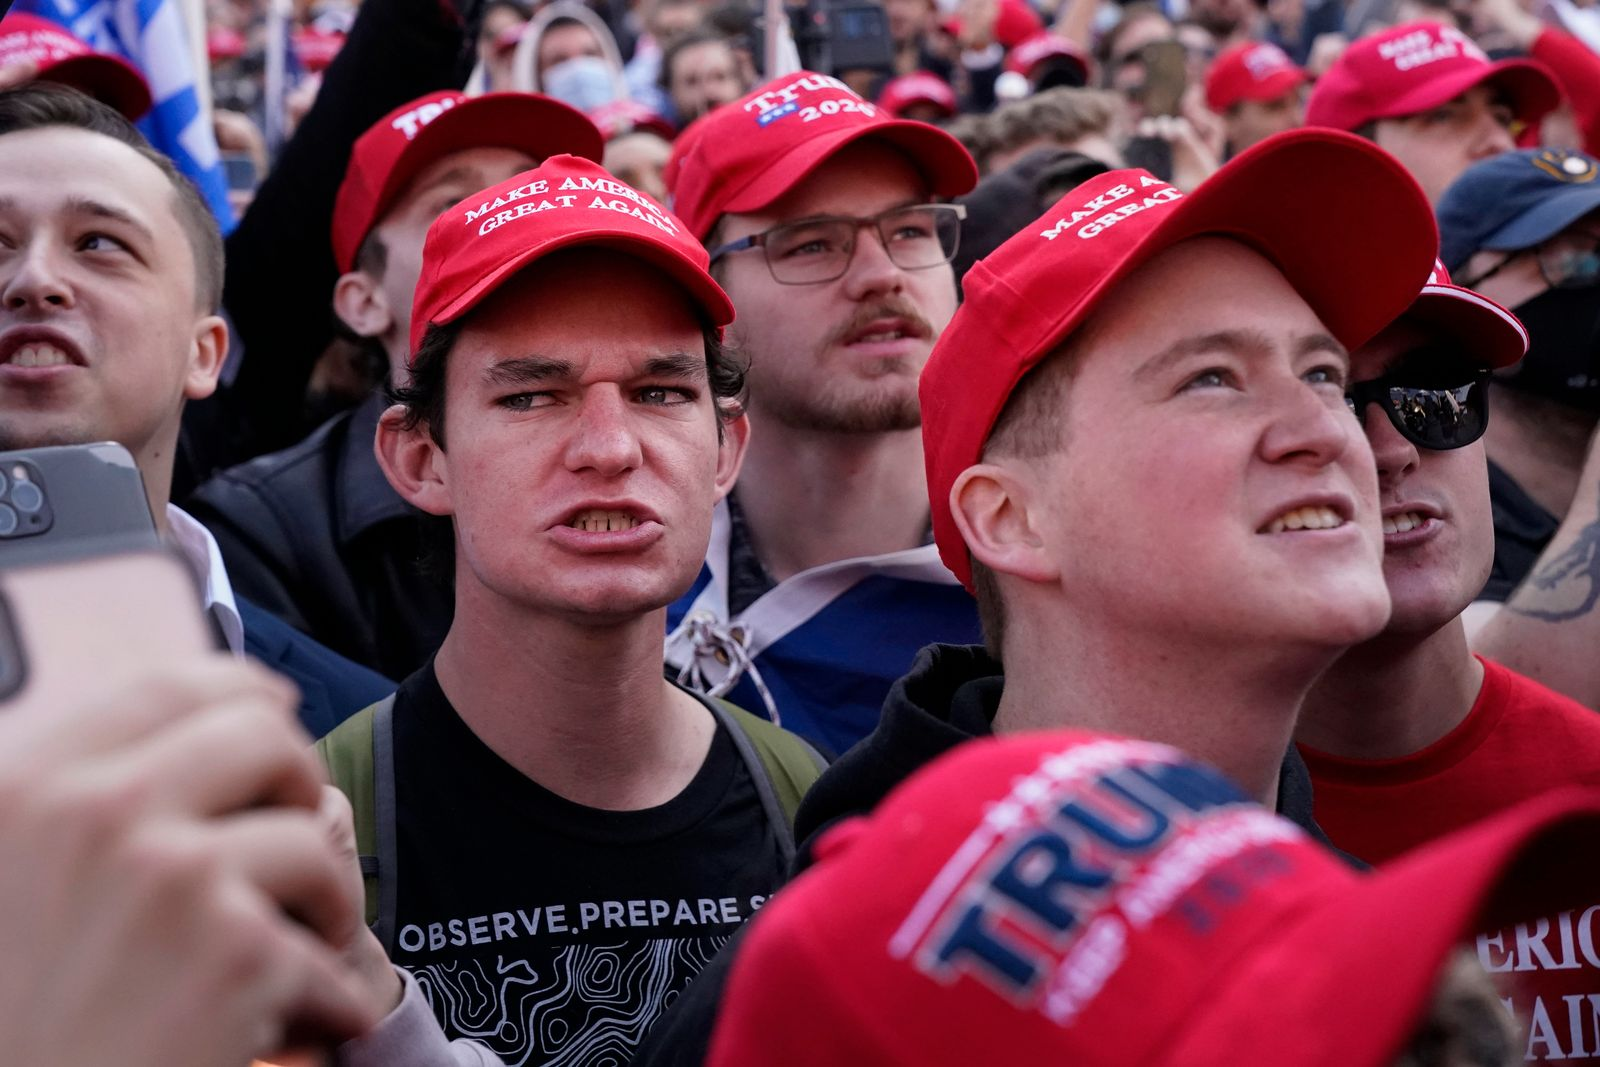 APTOPIX 2020 Election Protests Washington